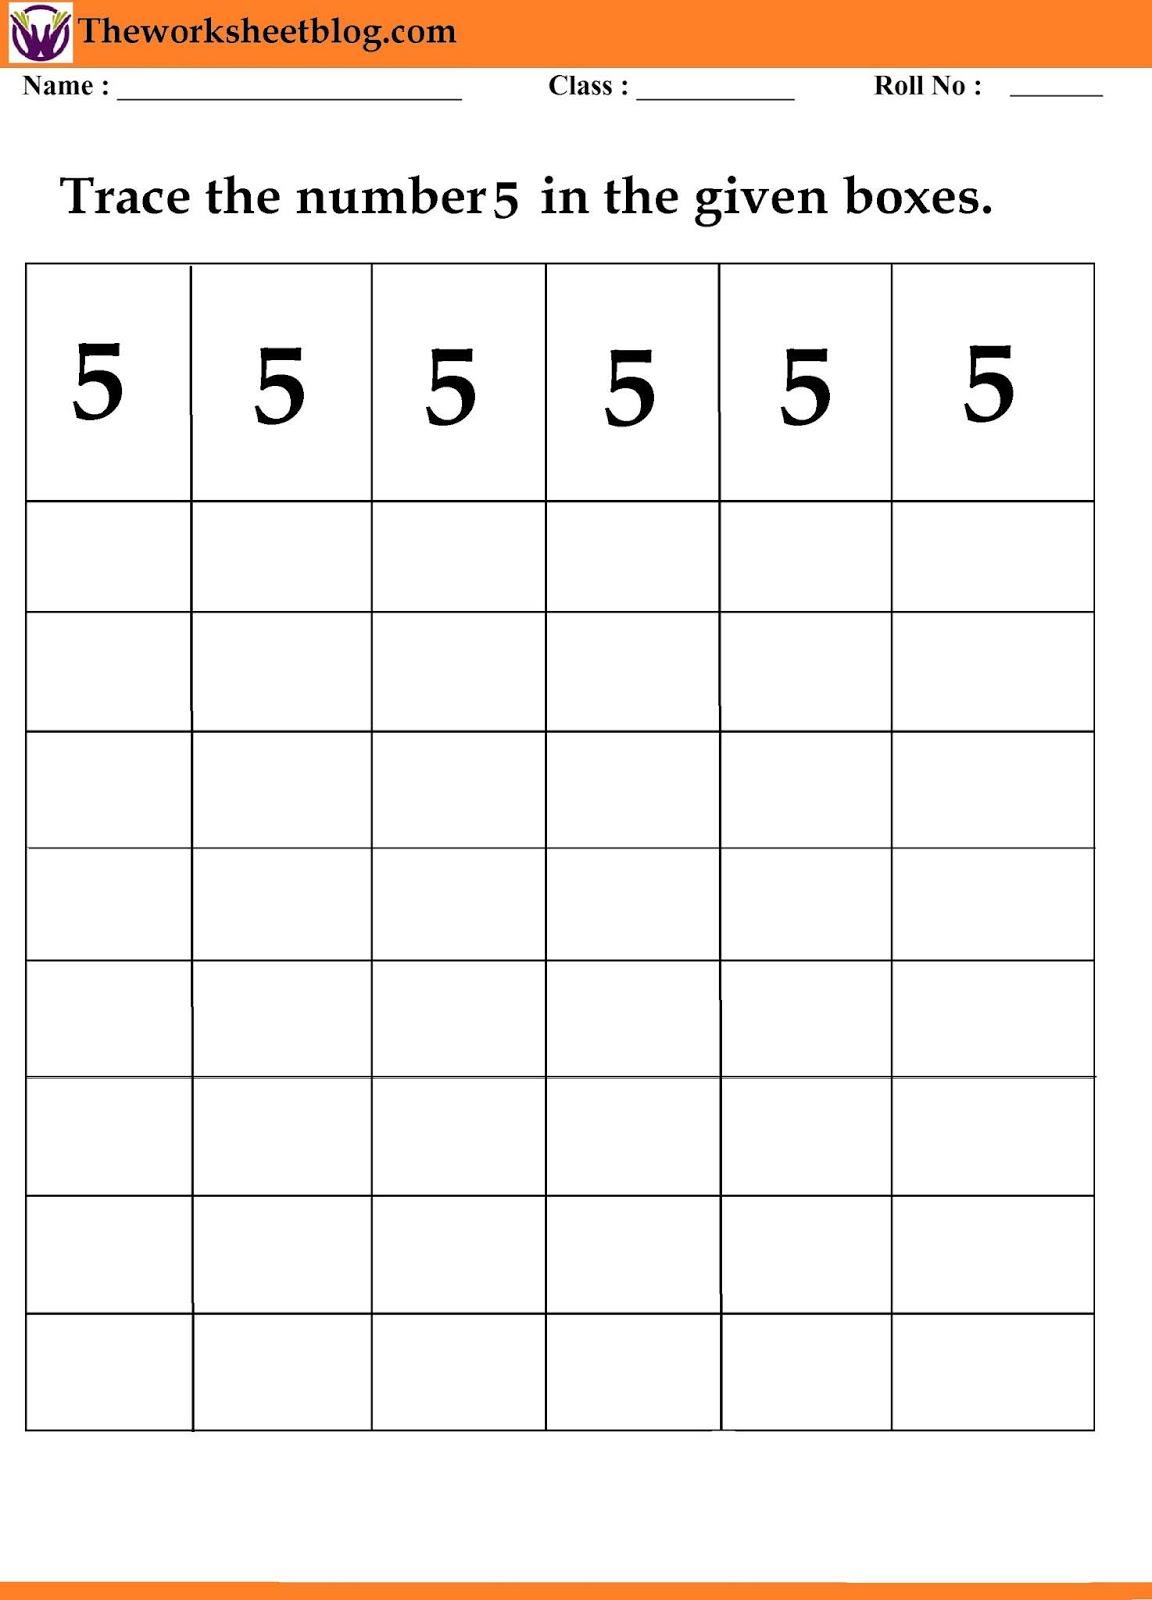 Number tracing worksheet - Theworksheetsblog